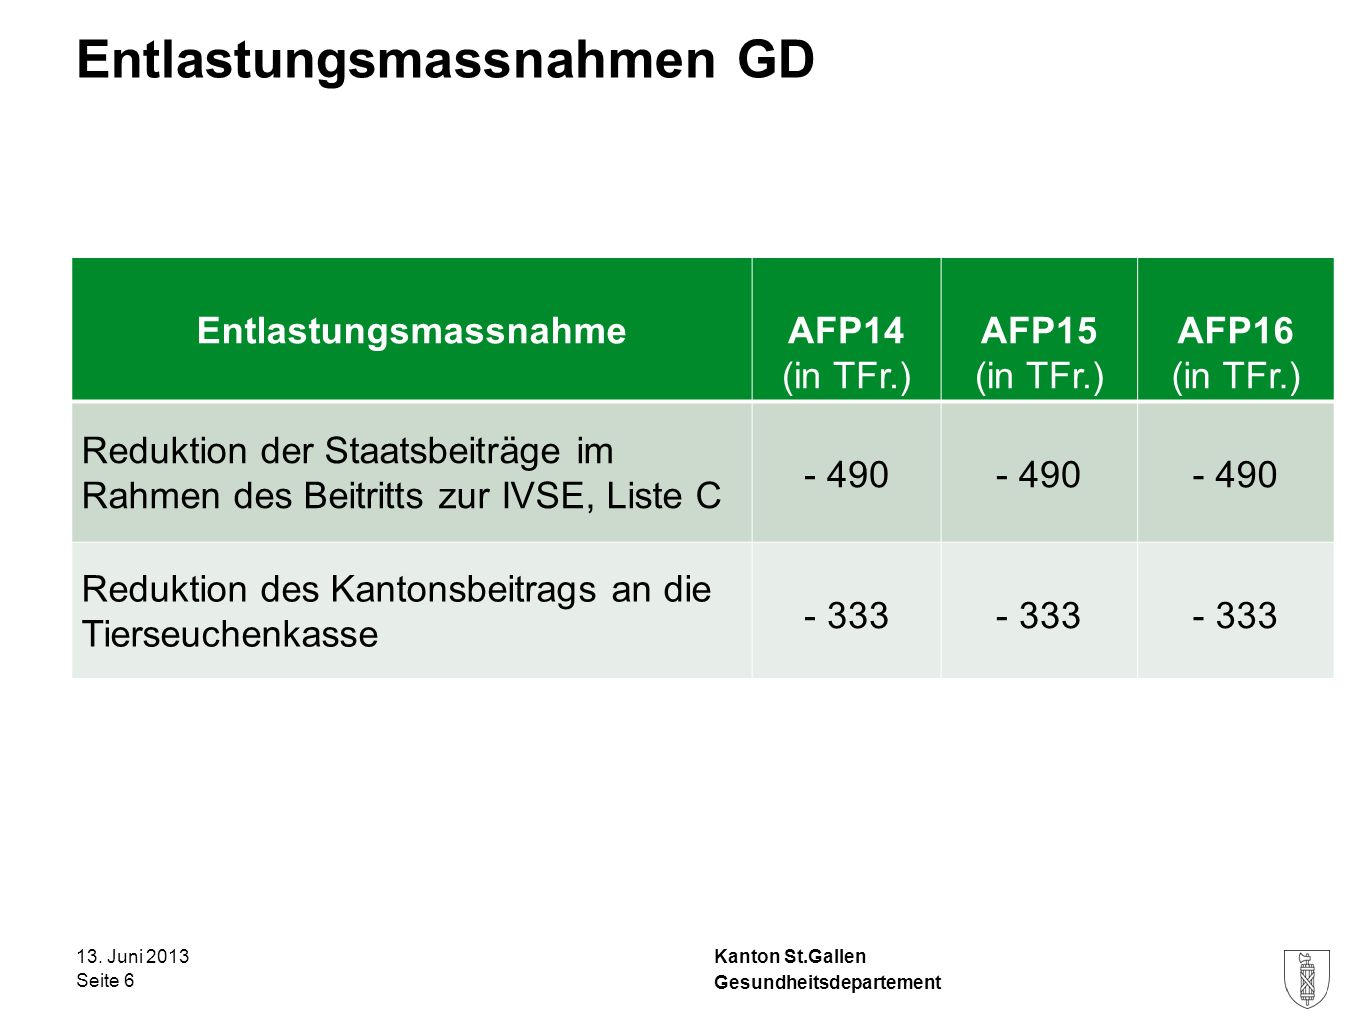 Kanton St.Gallen Entlastungsmassnahmen GD 13. Juni 2013 Seite 6 Gesundheitsdepartement EntlastungsmassnahmeAFP14 (in TFr.) AFP15 (in TFr.) AFP16 (in T